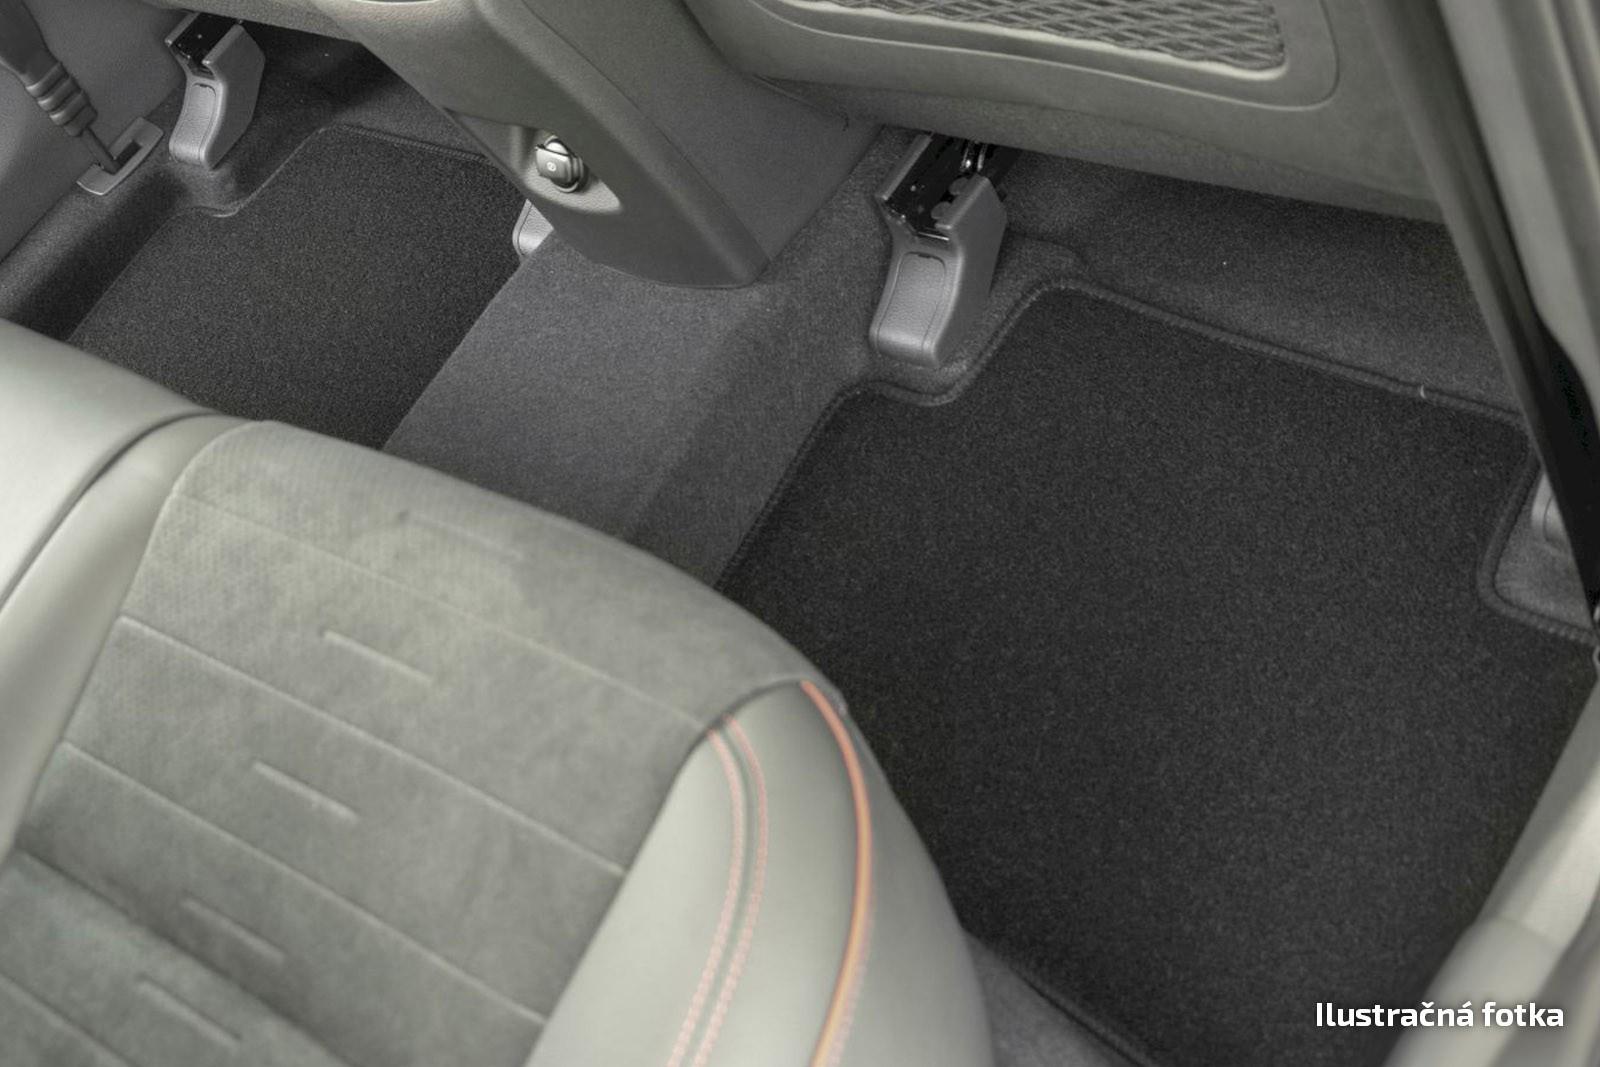 Poza cu Covorase din velur, Nissan Pathfinder, 2004-2012